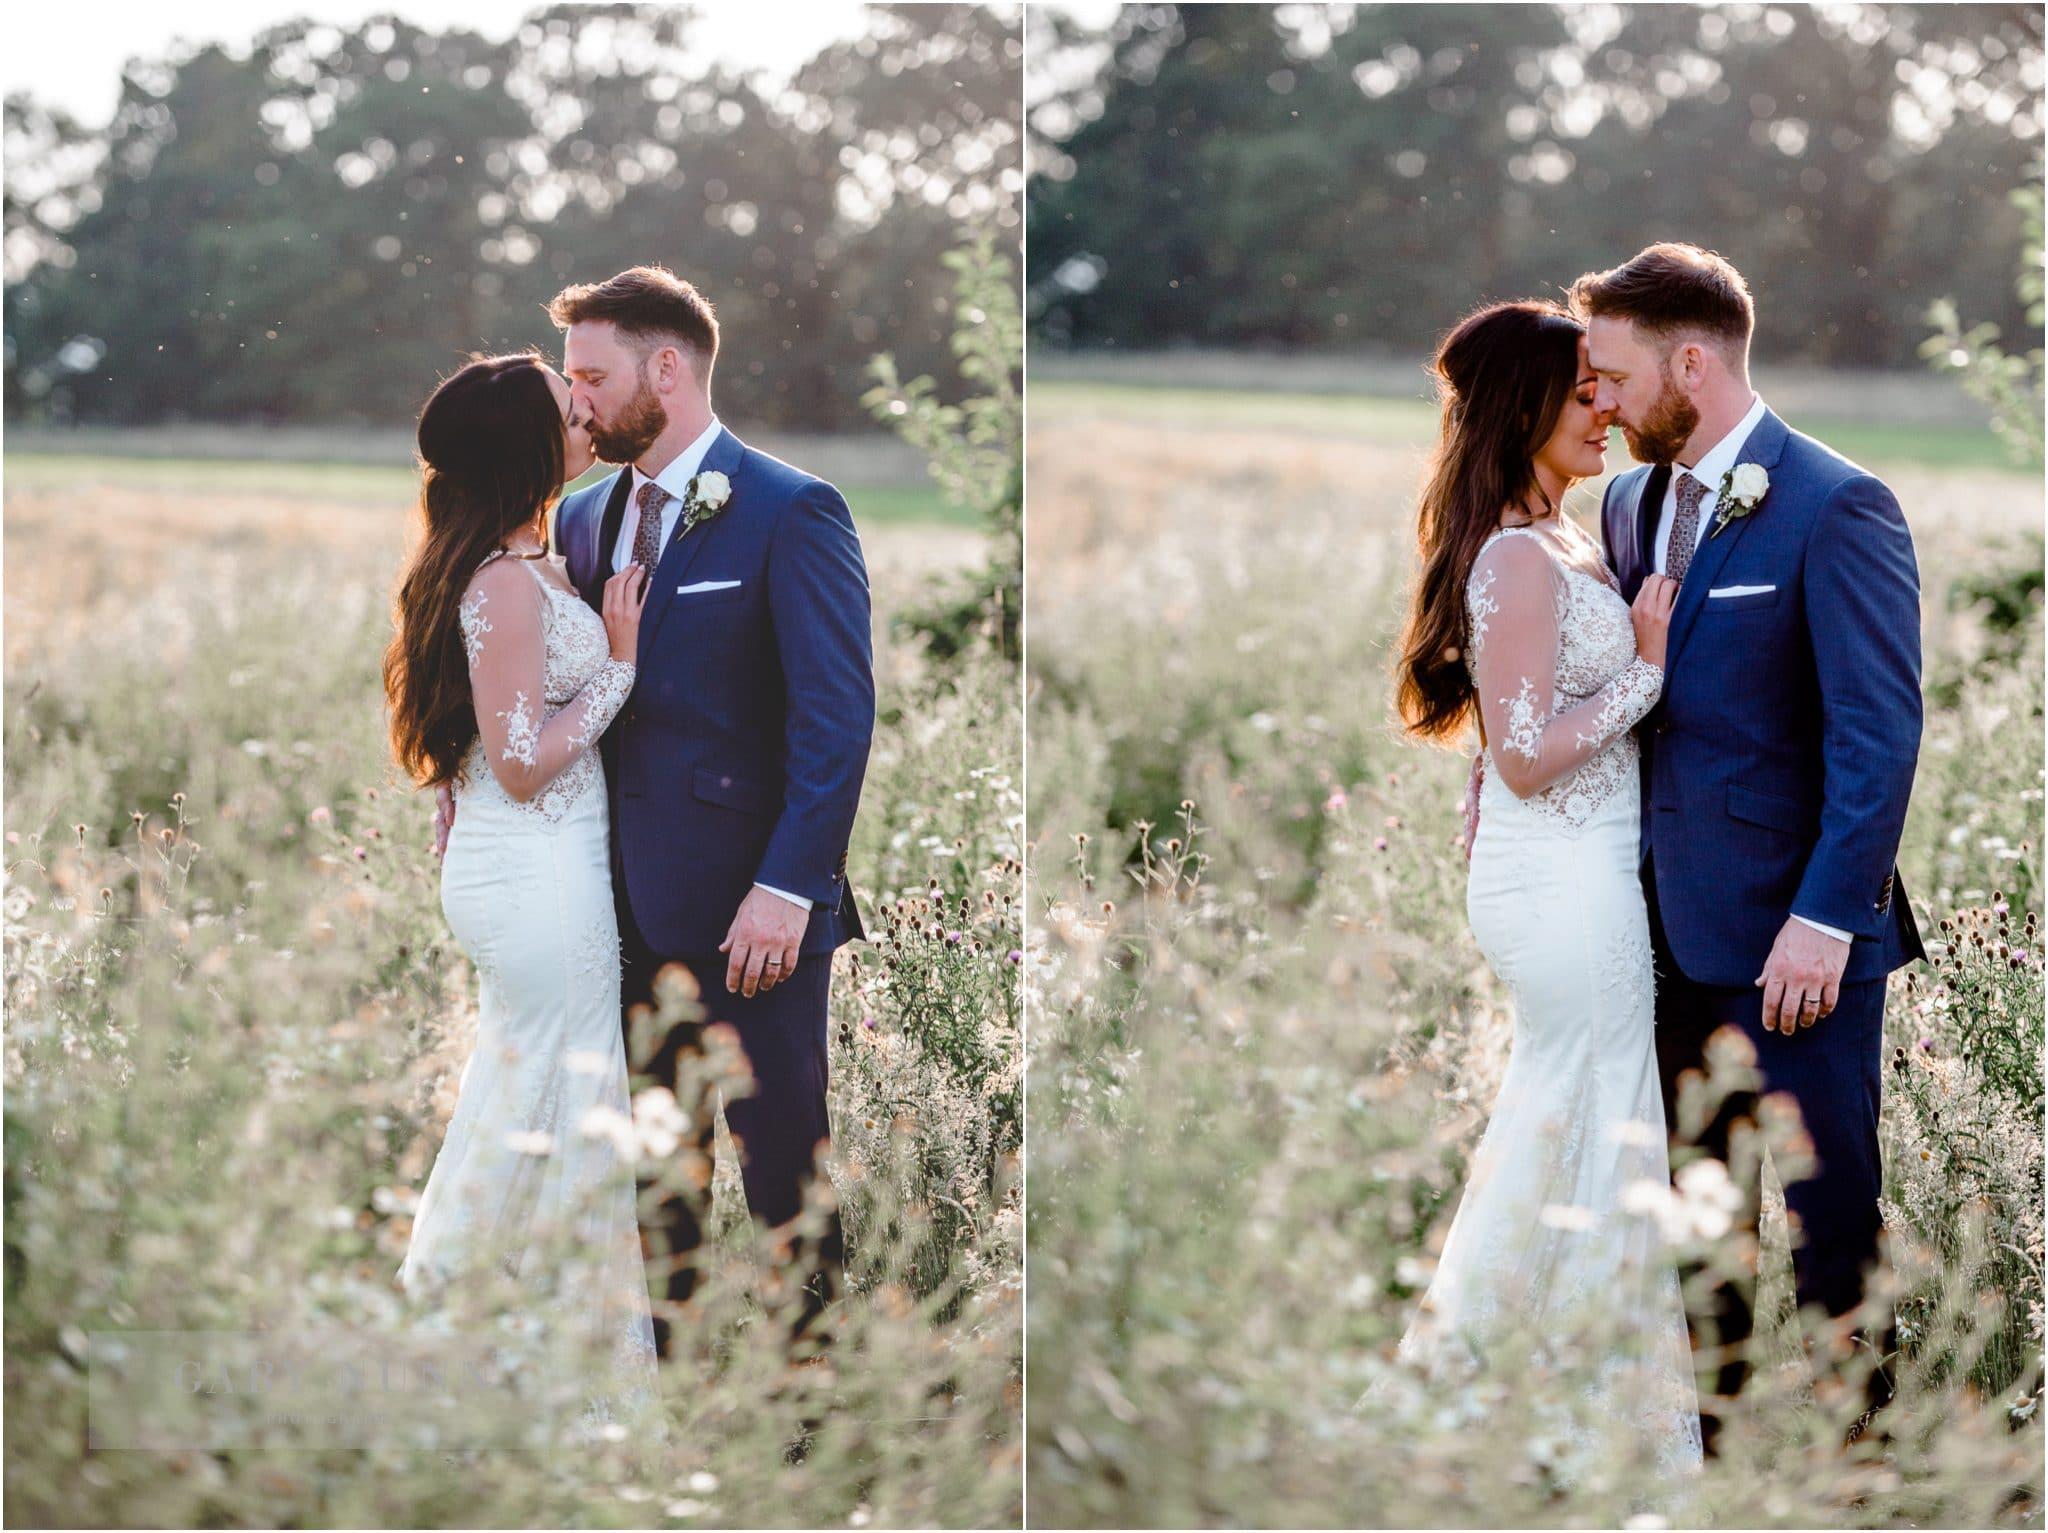 elmore court weddings, Destination Wedding Photographer, wedding photographer Milton Keynes, Elmore Court